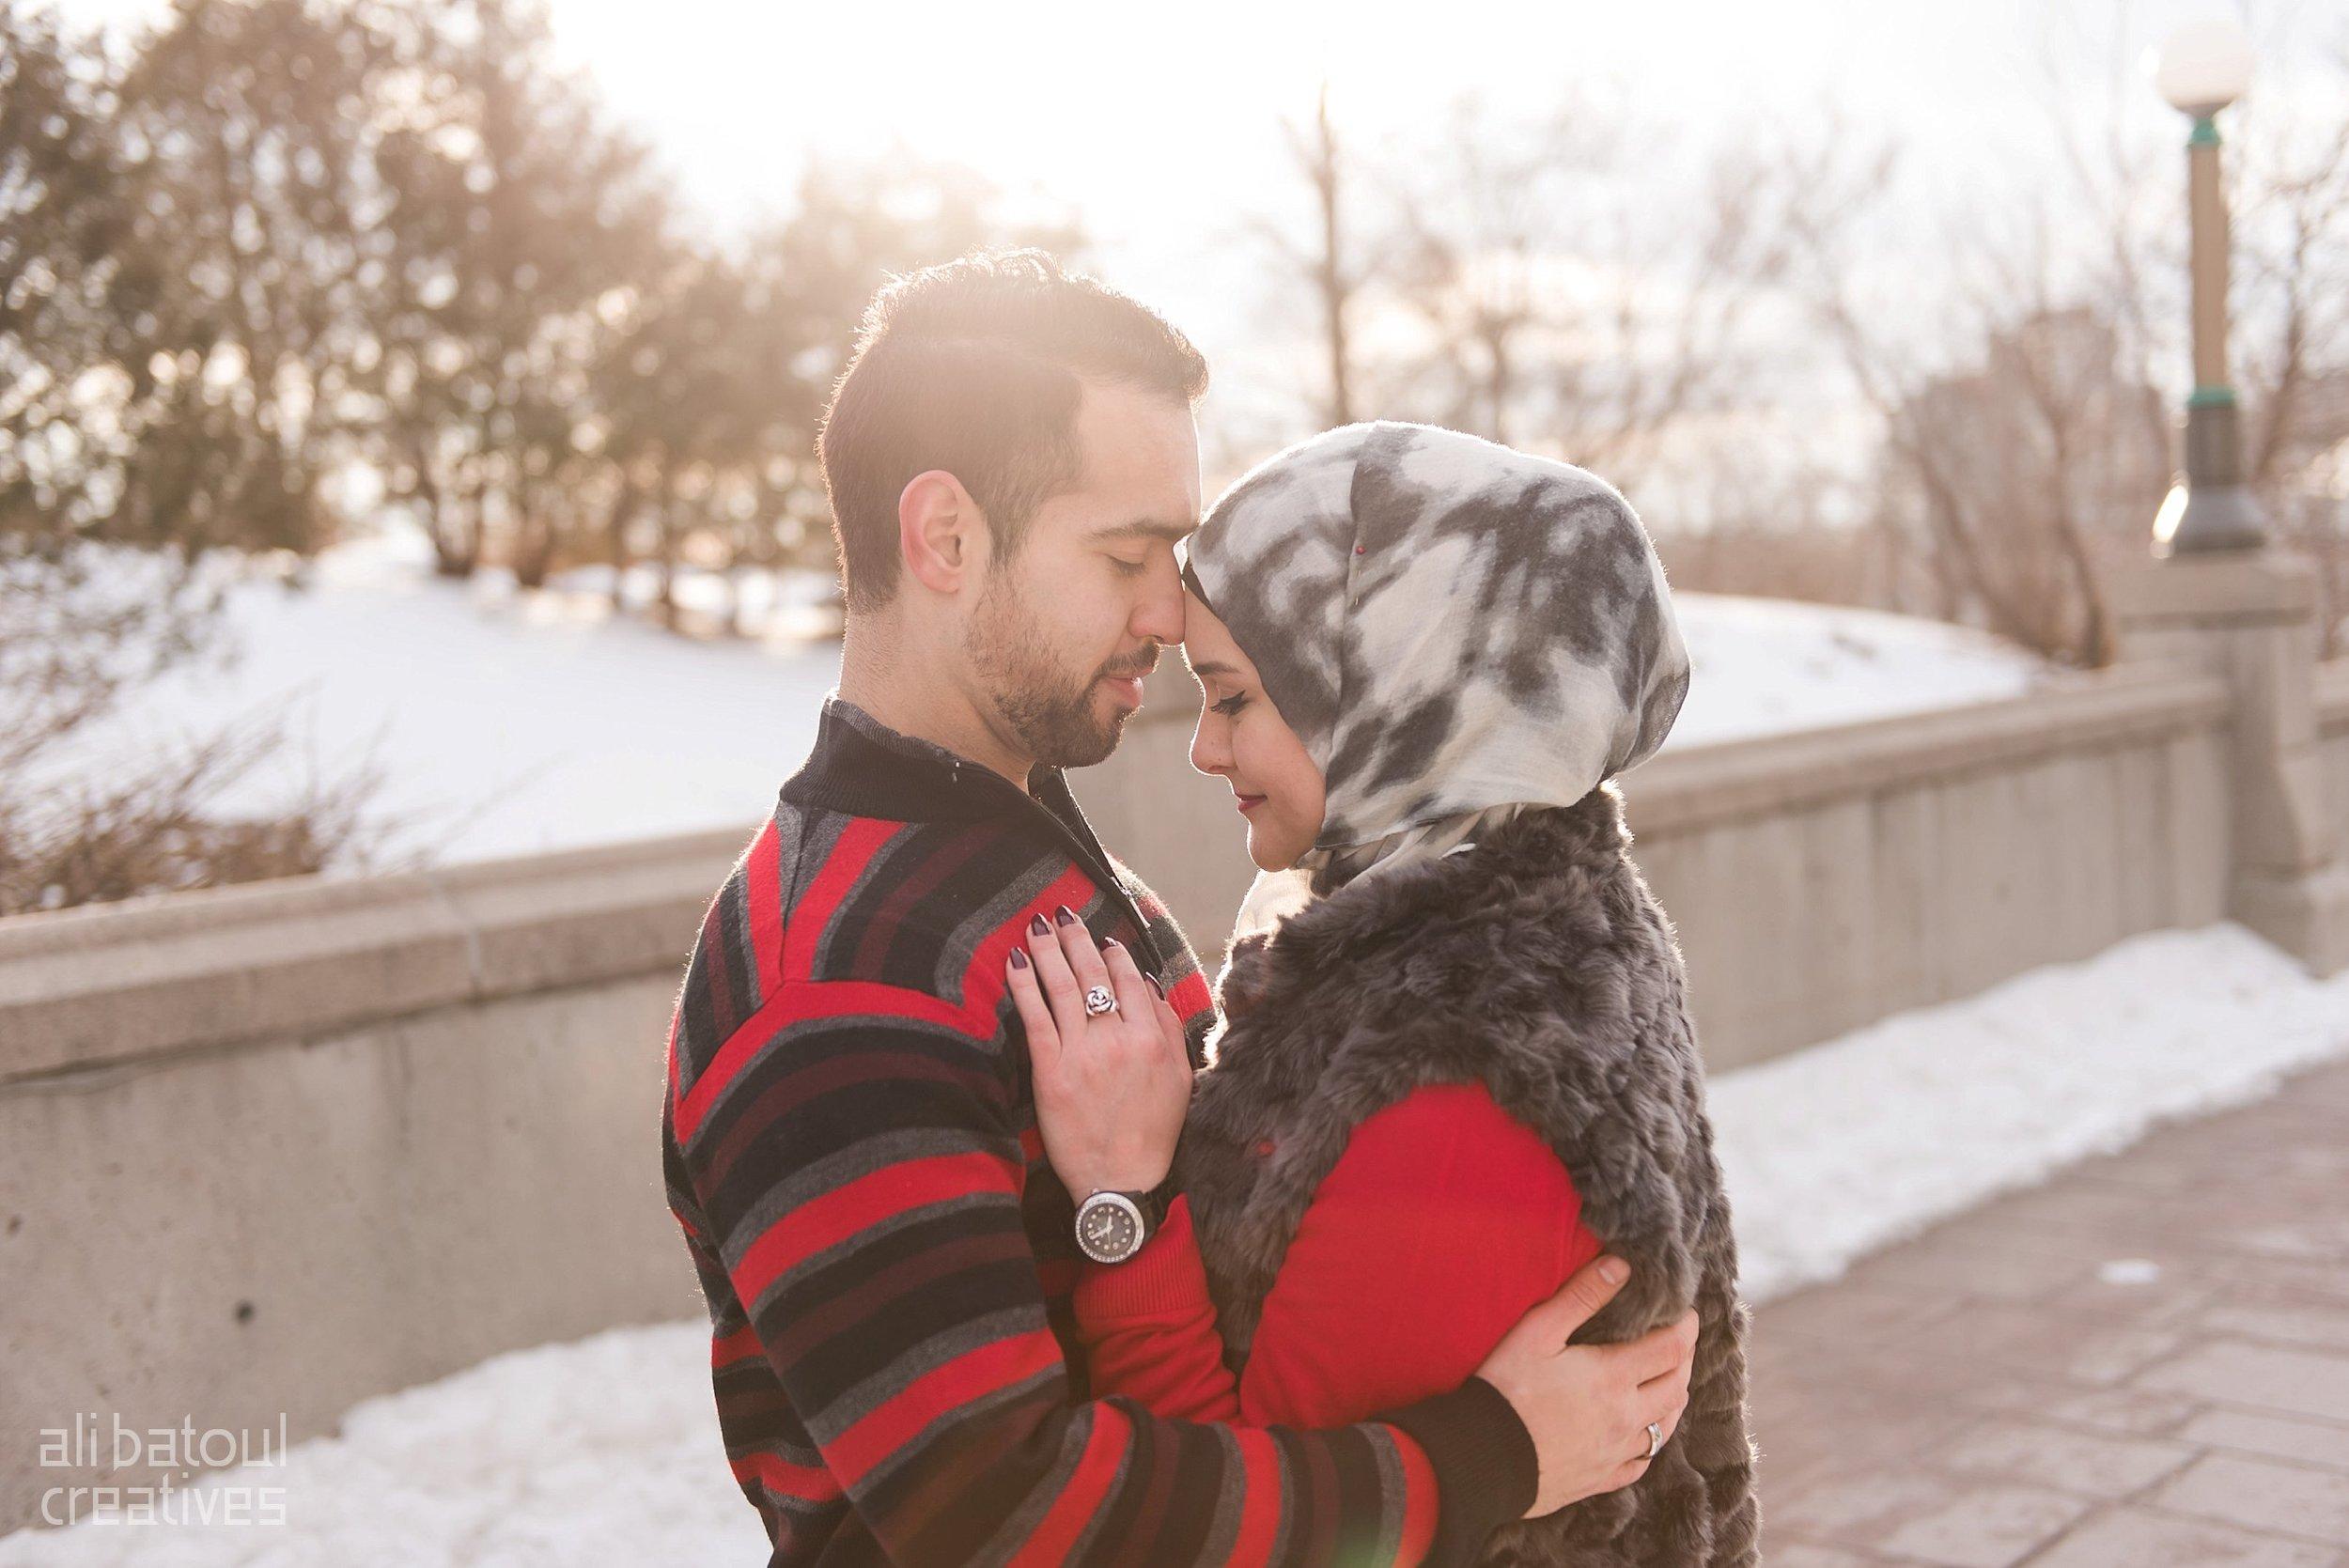 Hanan + Said Engagement - Ali Batoul Creatives Photography_0031.jpg